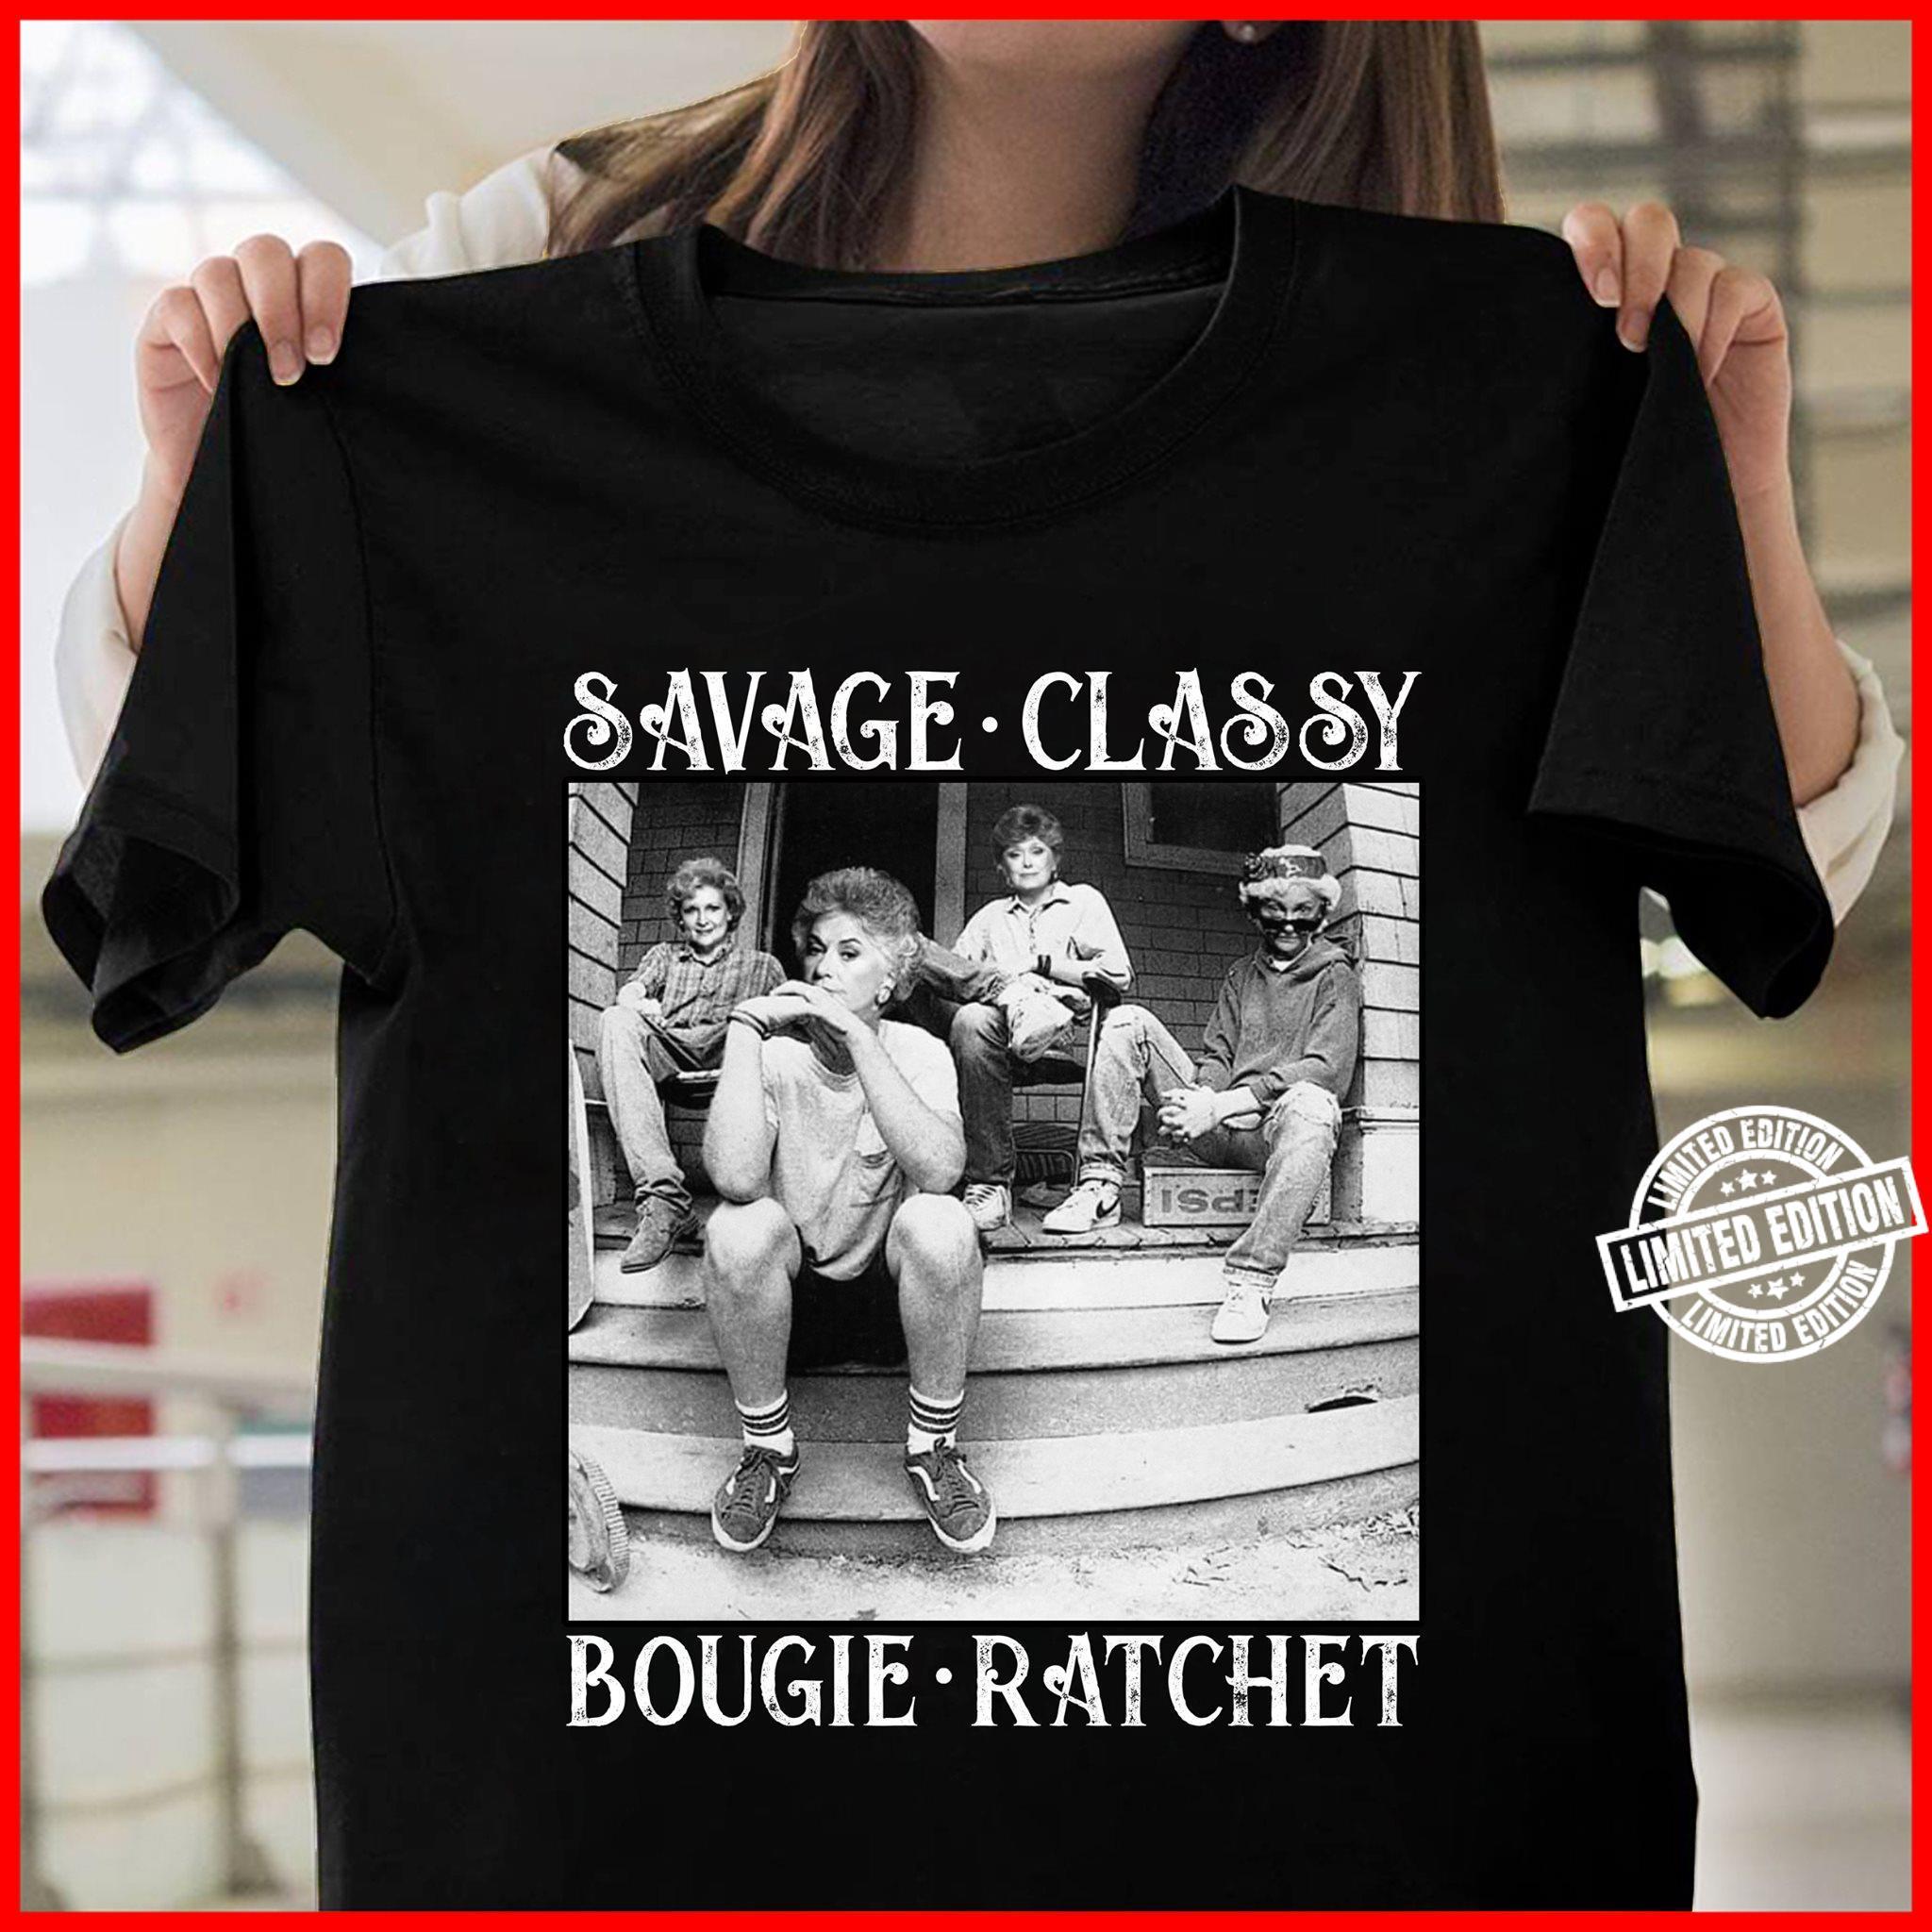 Savage classy bougie ratchet shirt